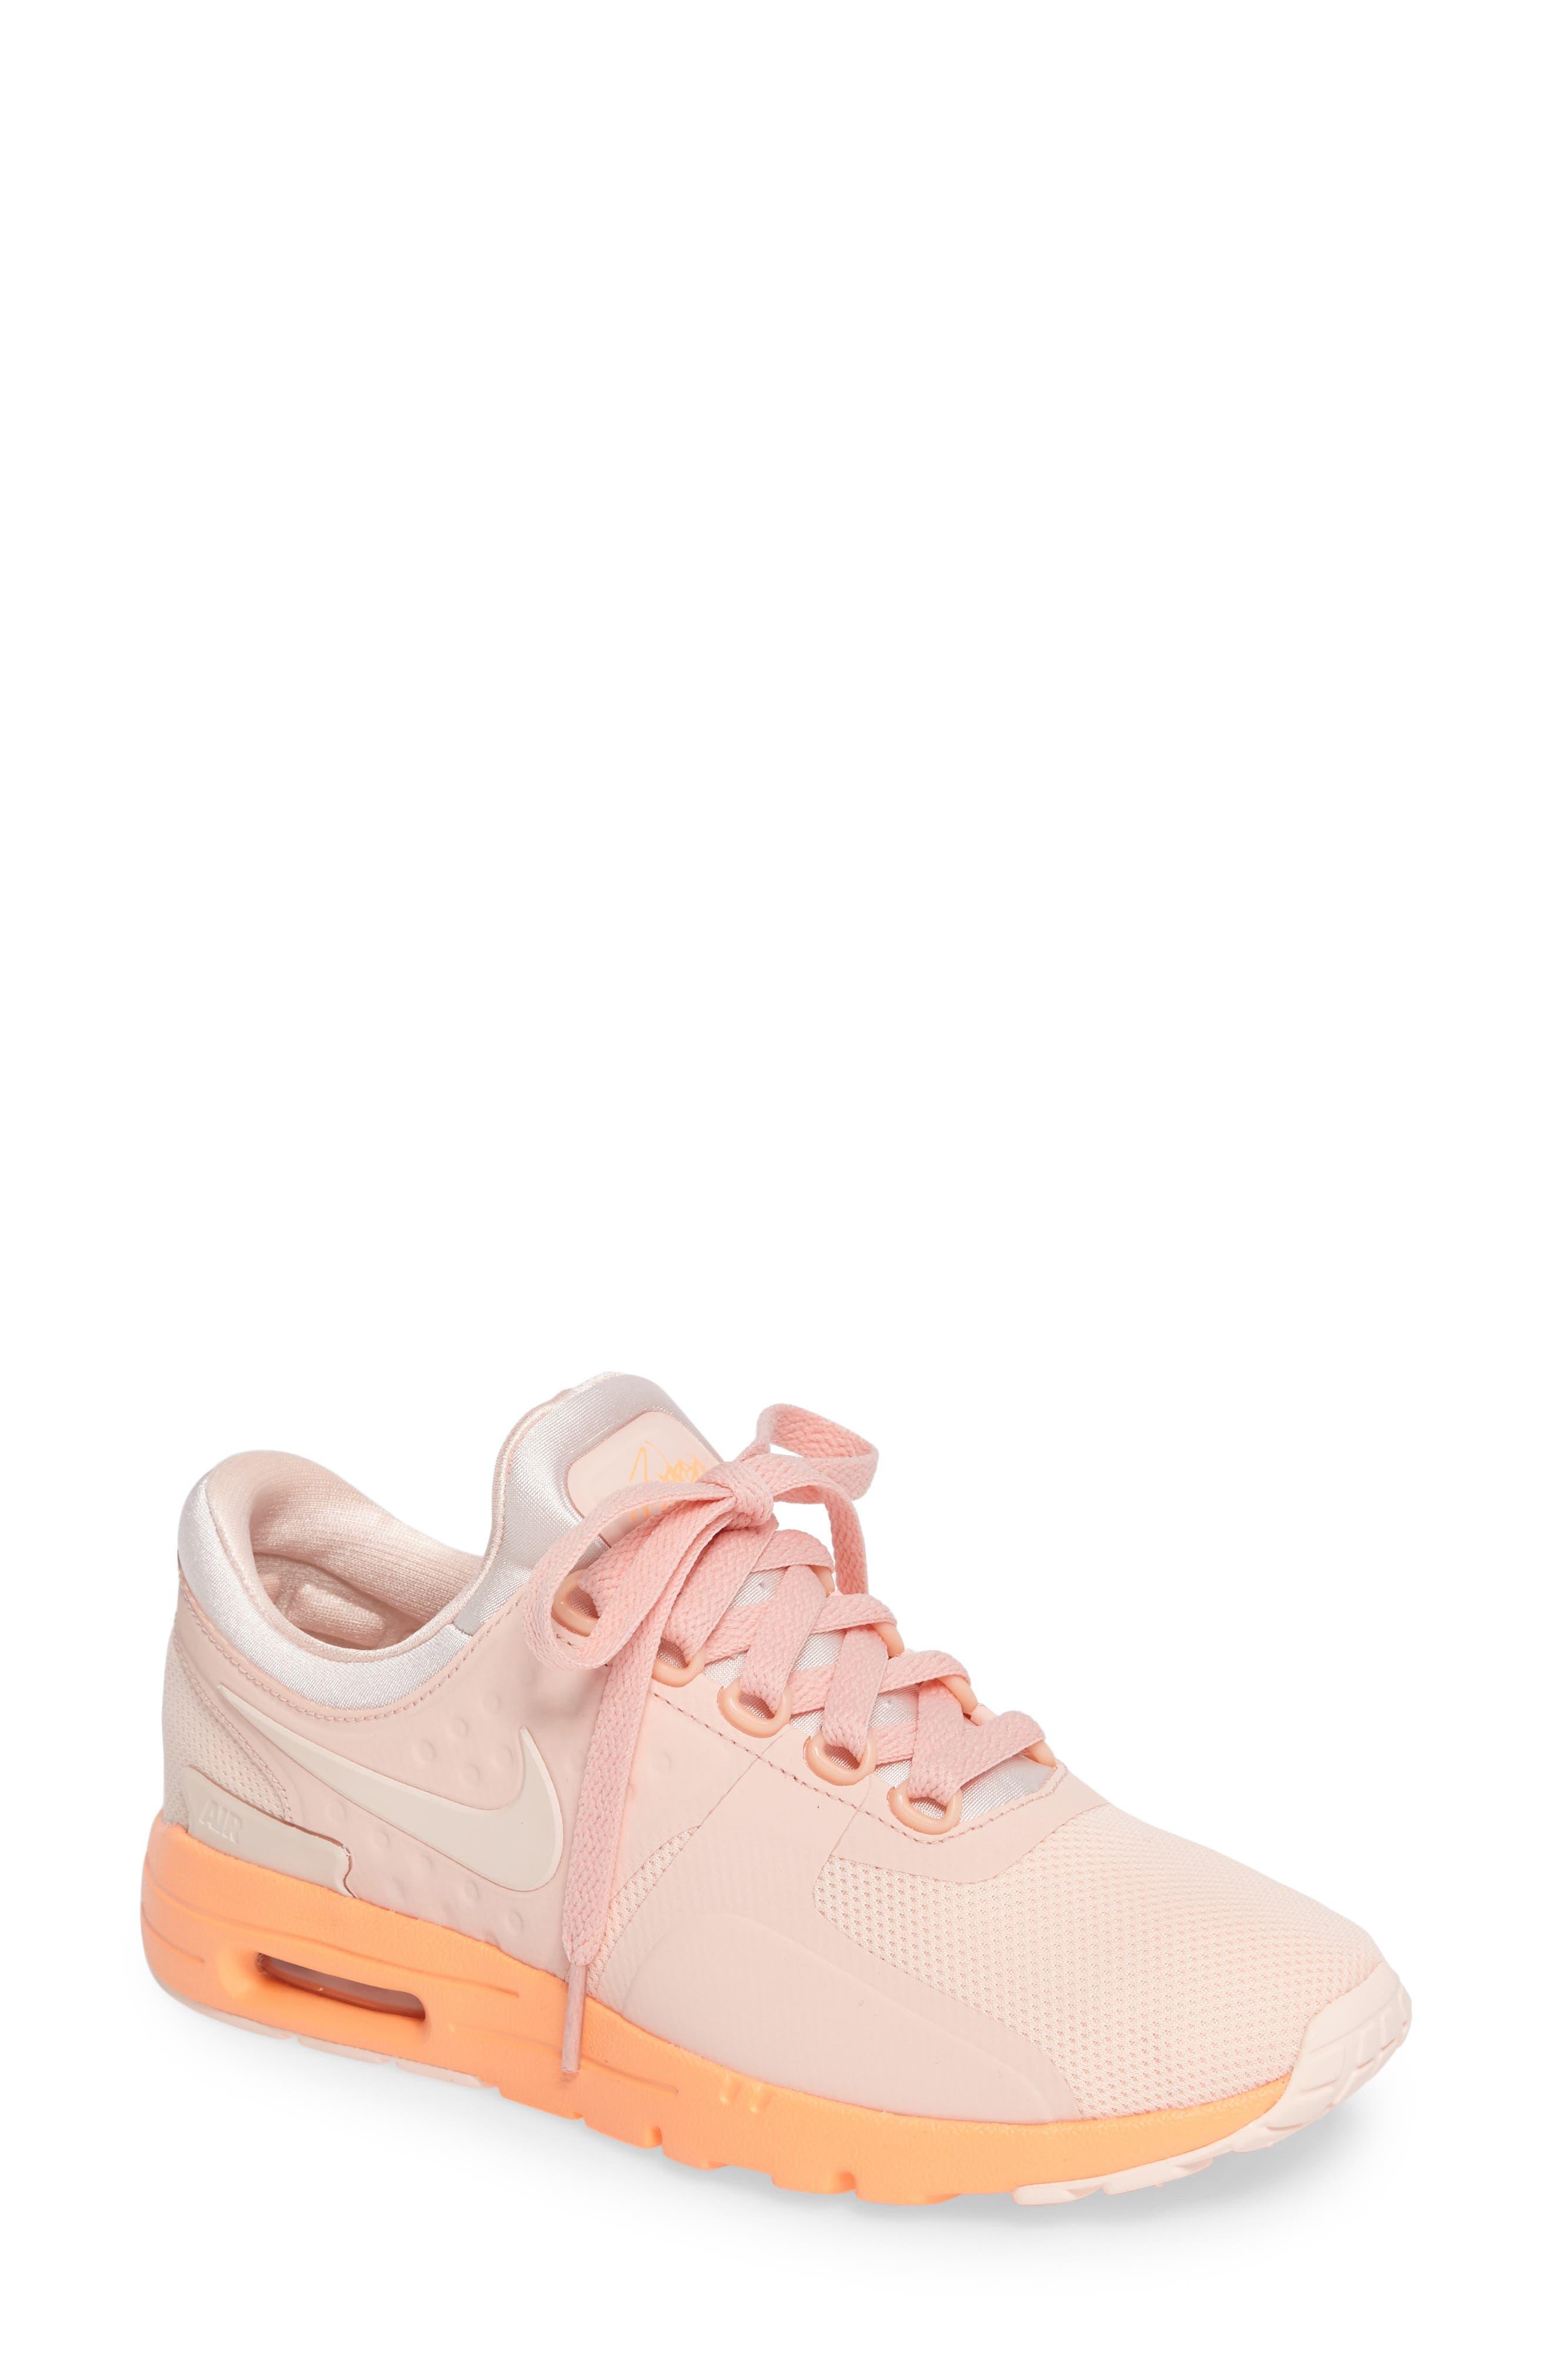 Nike Air Max Zero Sneaker (Women)